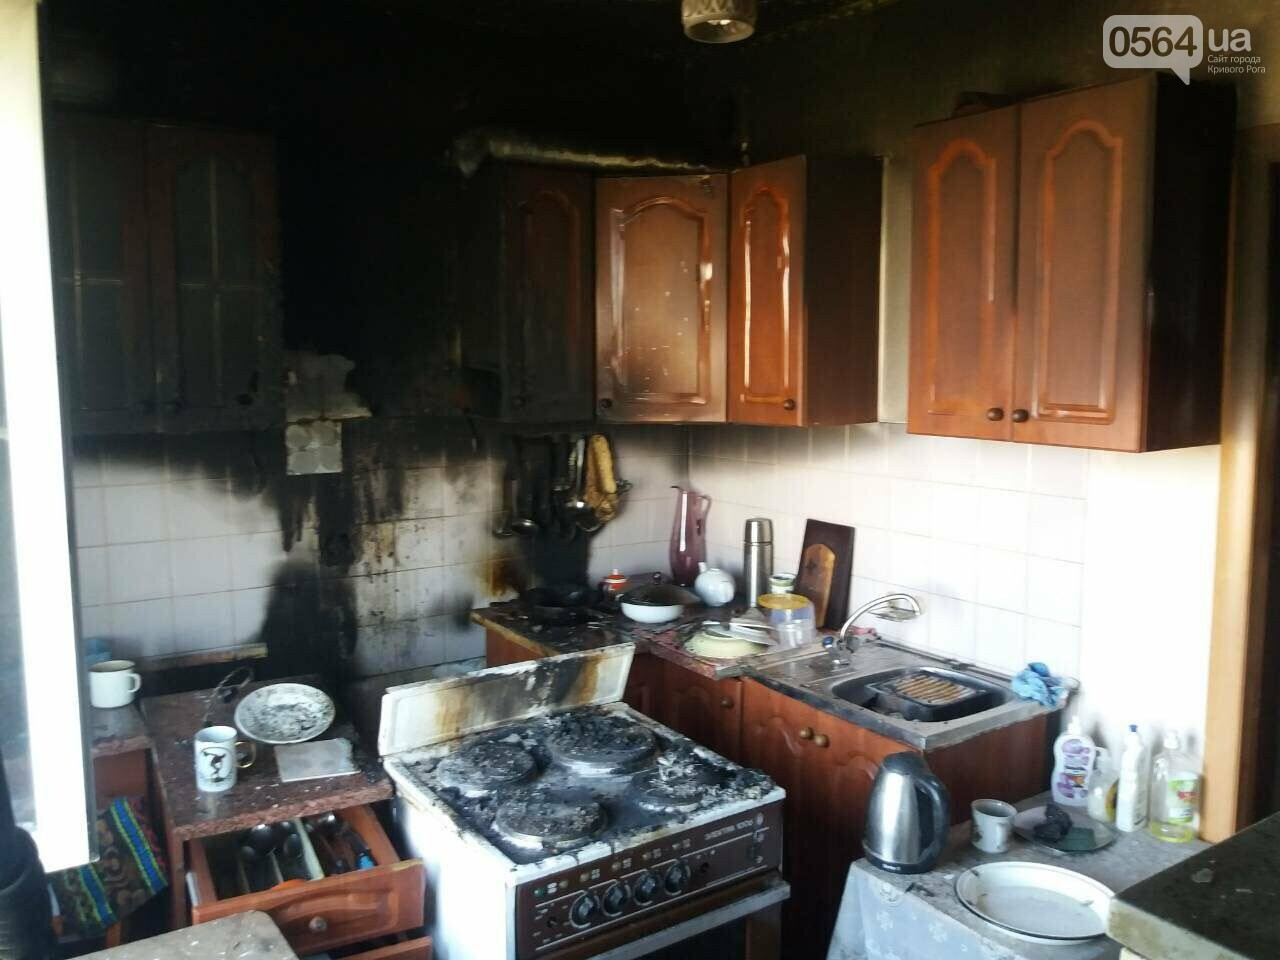 В Кривом Роге загорелась квартира на 13 этаже, - ФОТО, фото-1